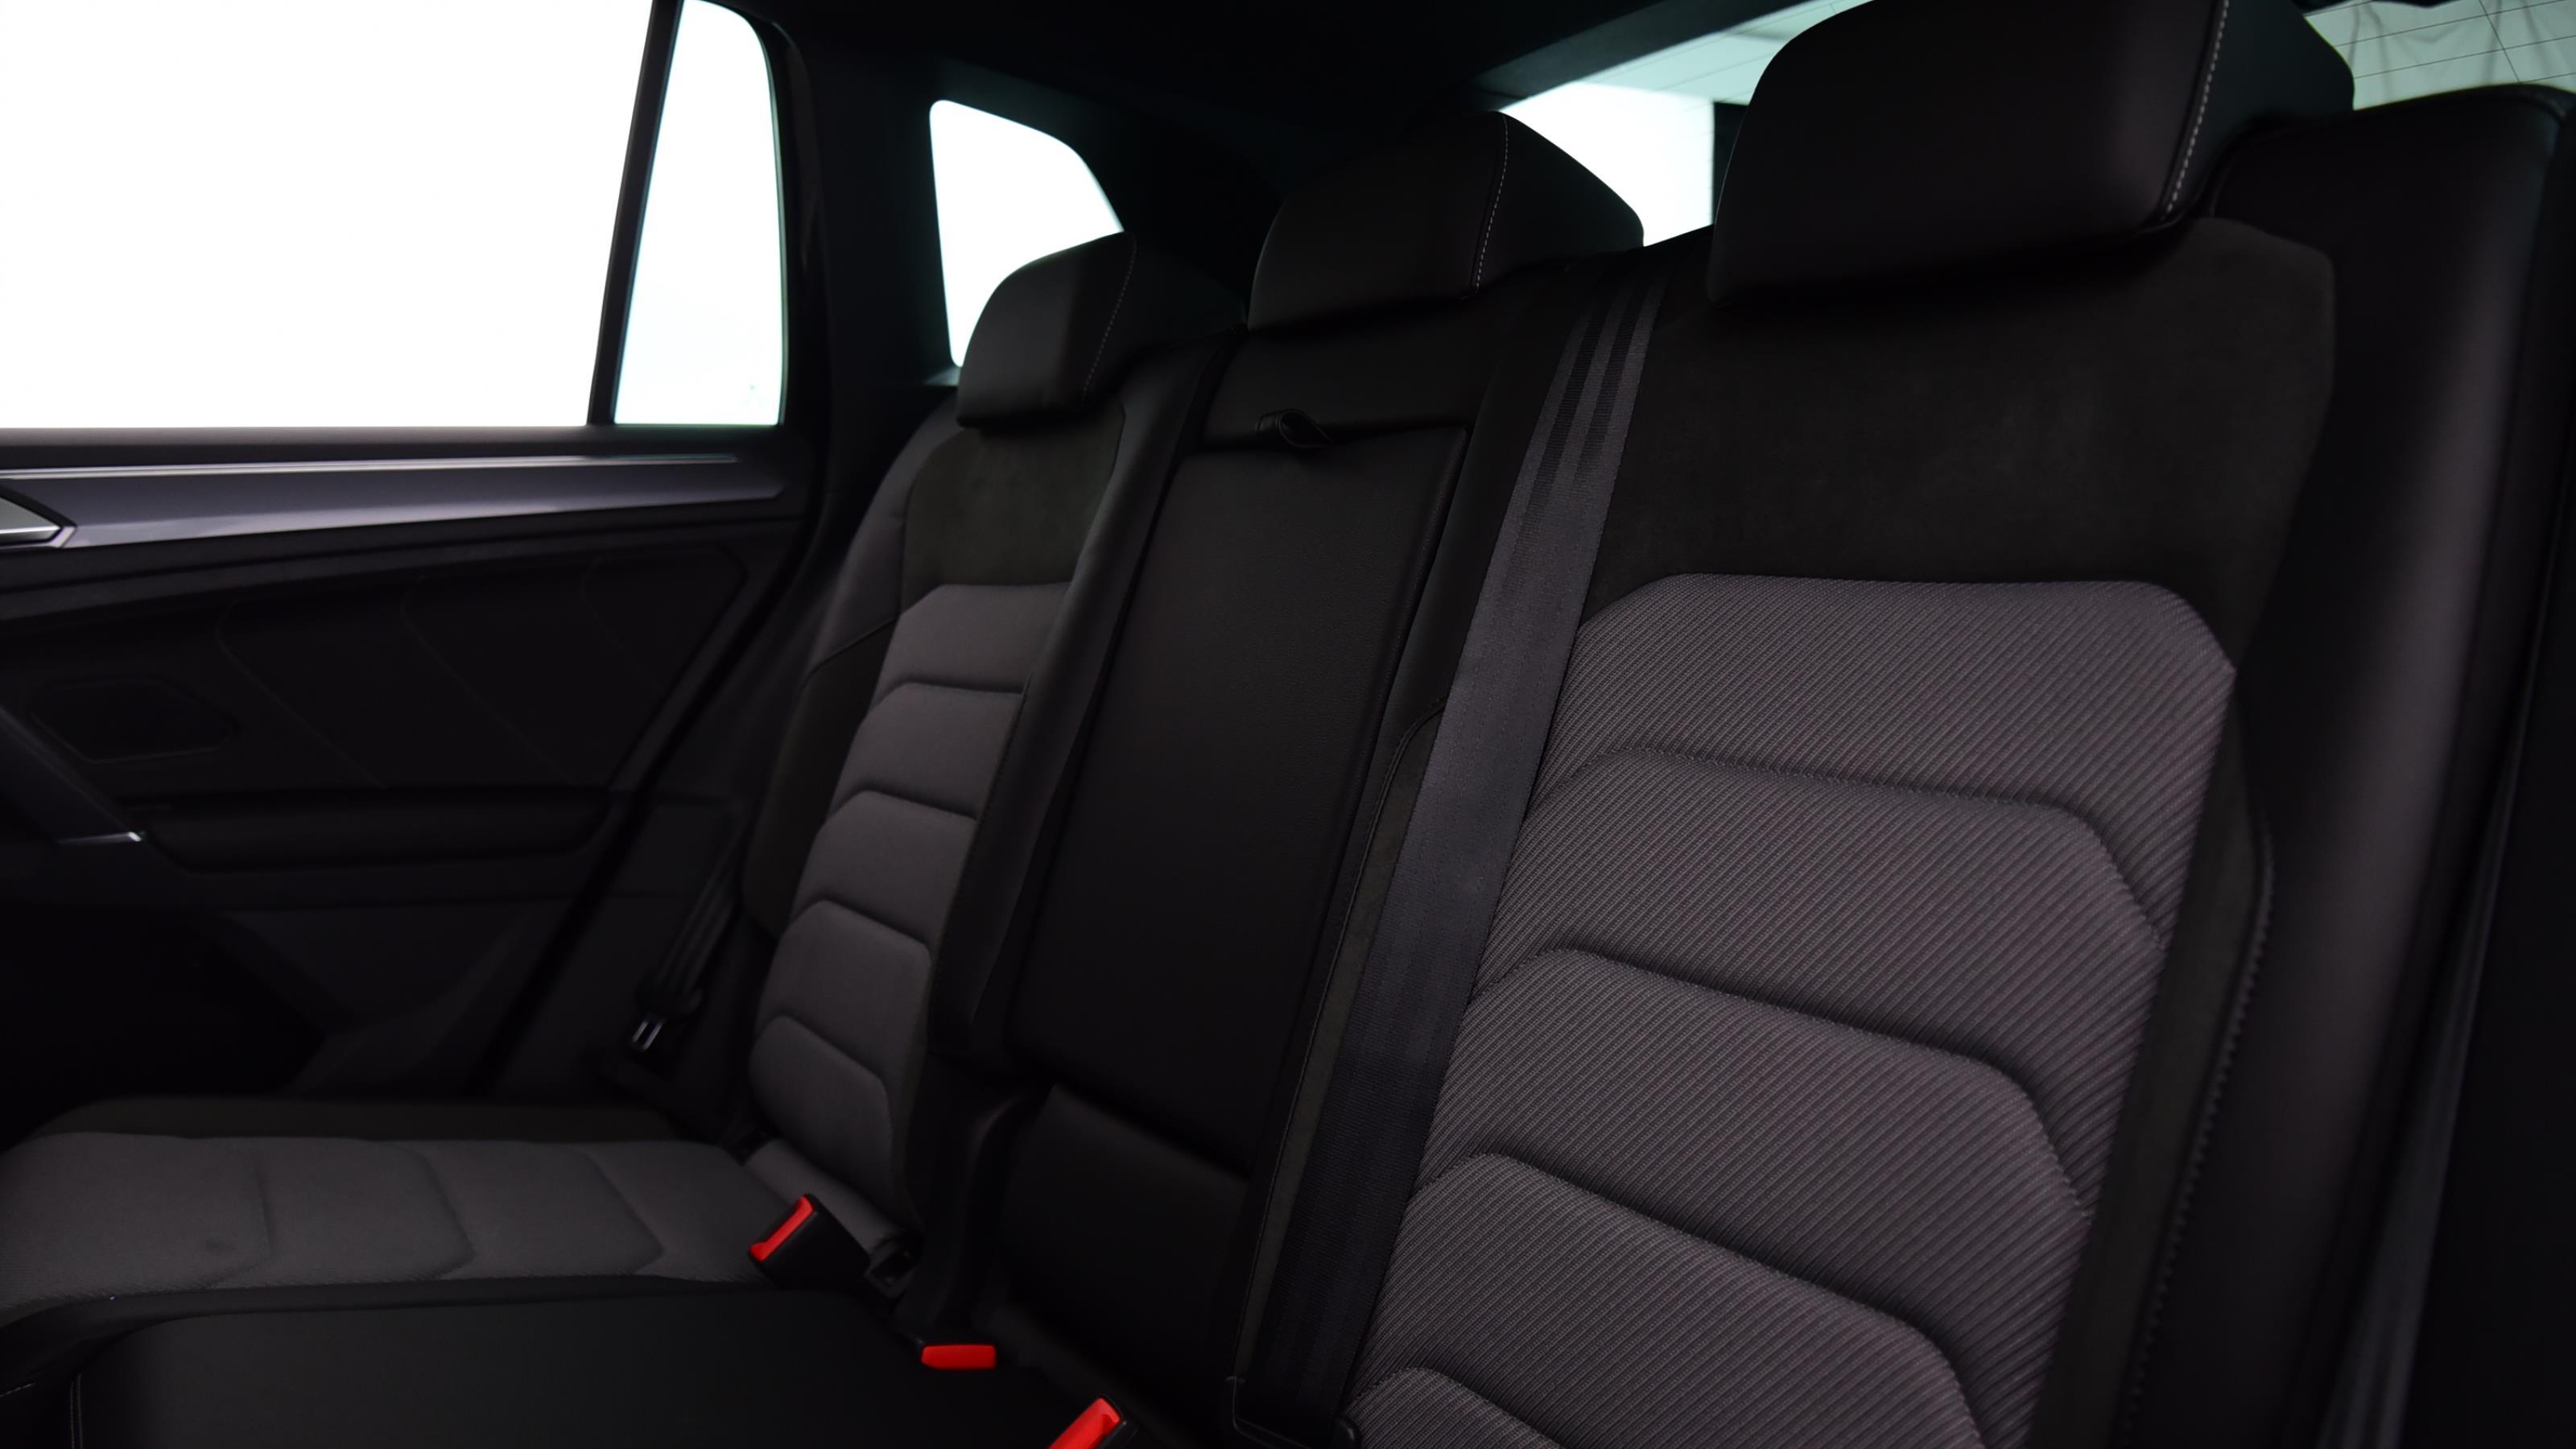 Used 2017 Volkswagen TIGUAN 2.0 TDi 150 R Line 5dr DSG BLACK at Saxton4x4